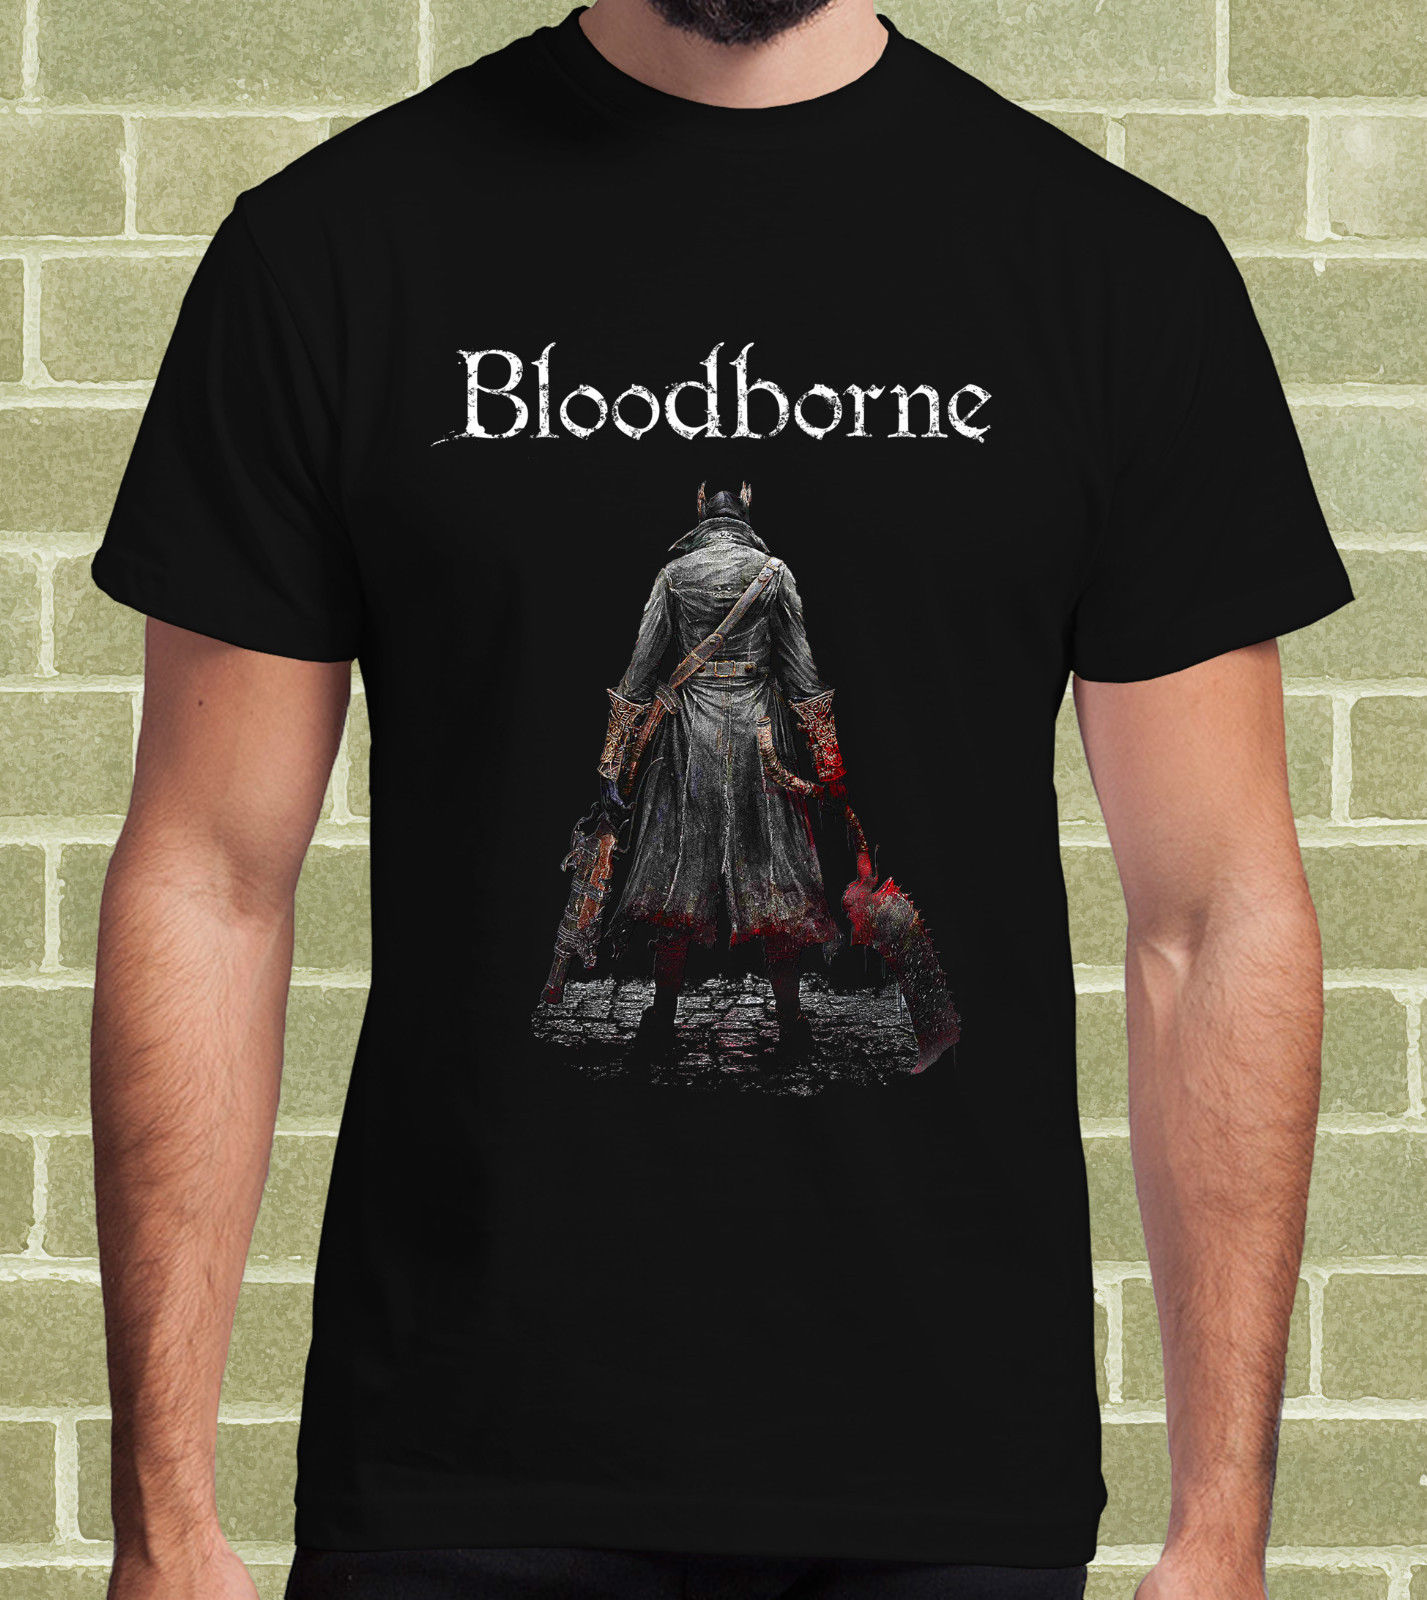 gildan-bloodborne-fontbvideogame-b-font-t-shirt-per-uomo-e-bambino-mens-t-shirt